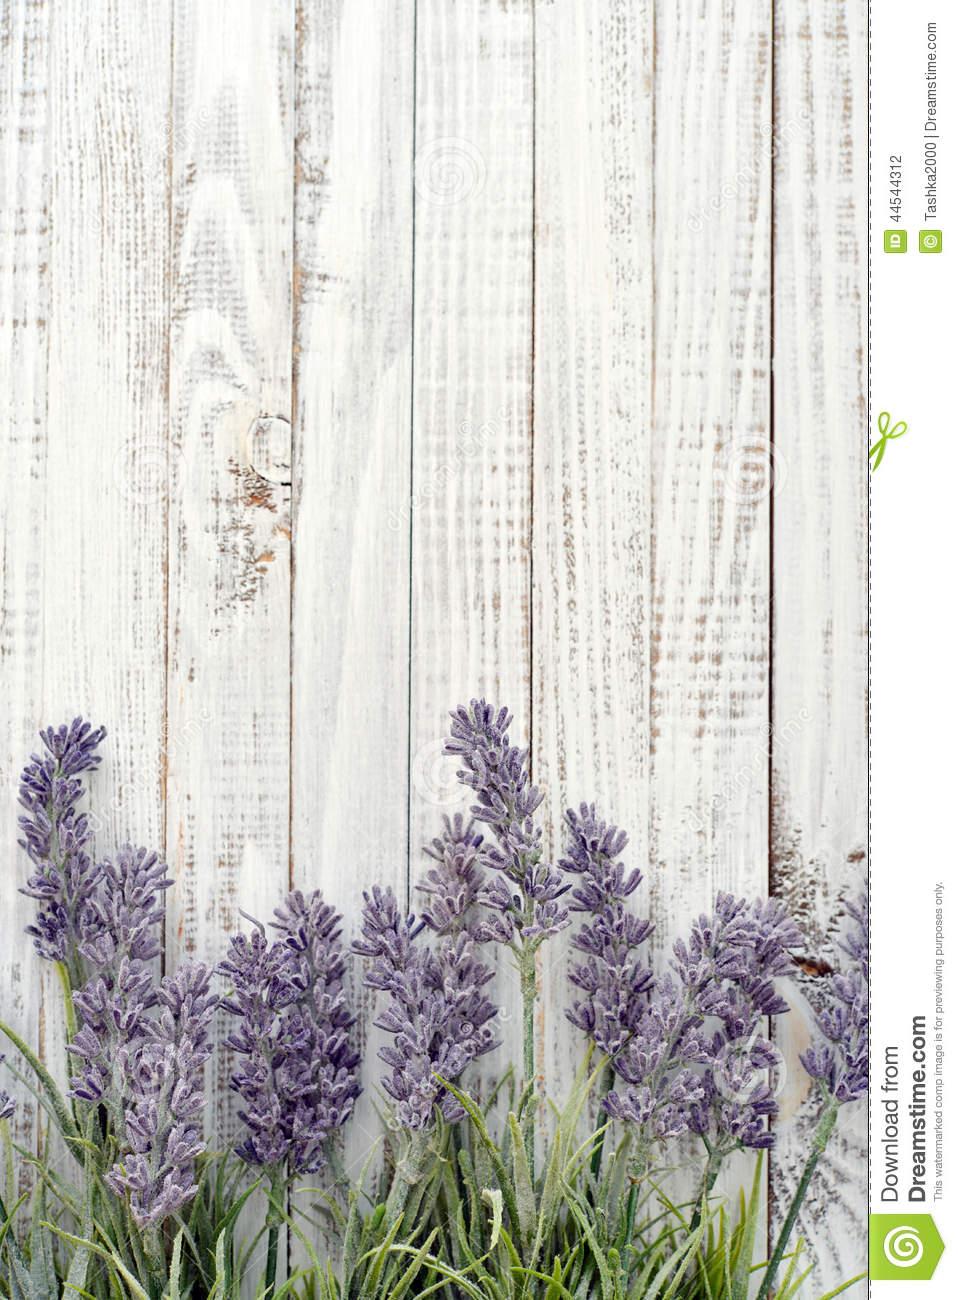 Bouquet lavender stock photo. Image of flora, shabby - 44544312